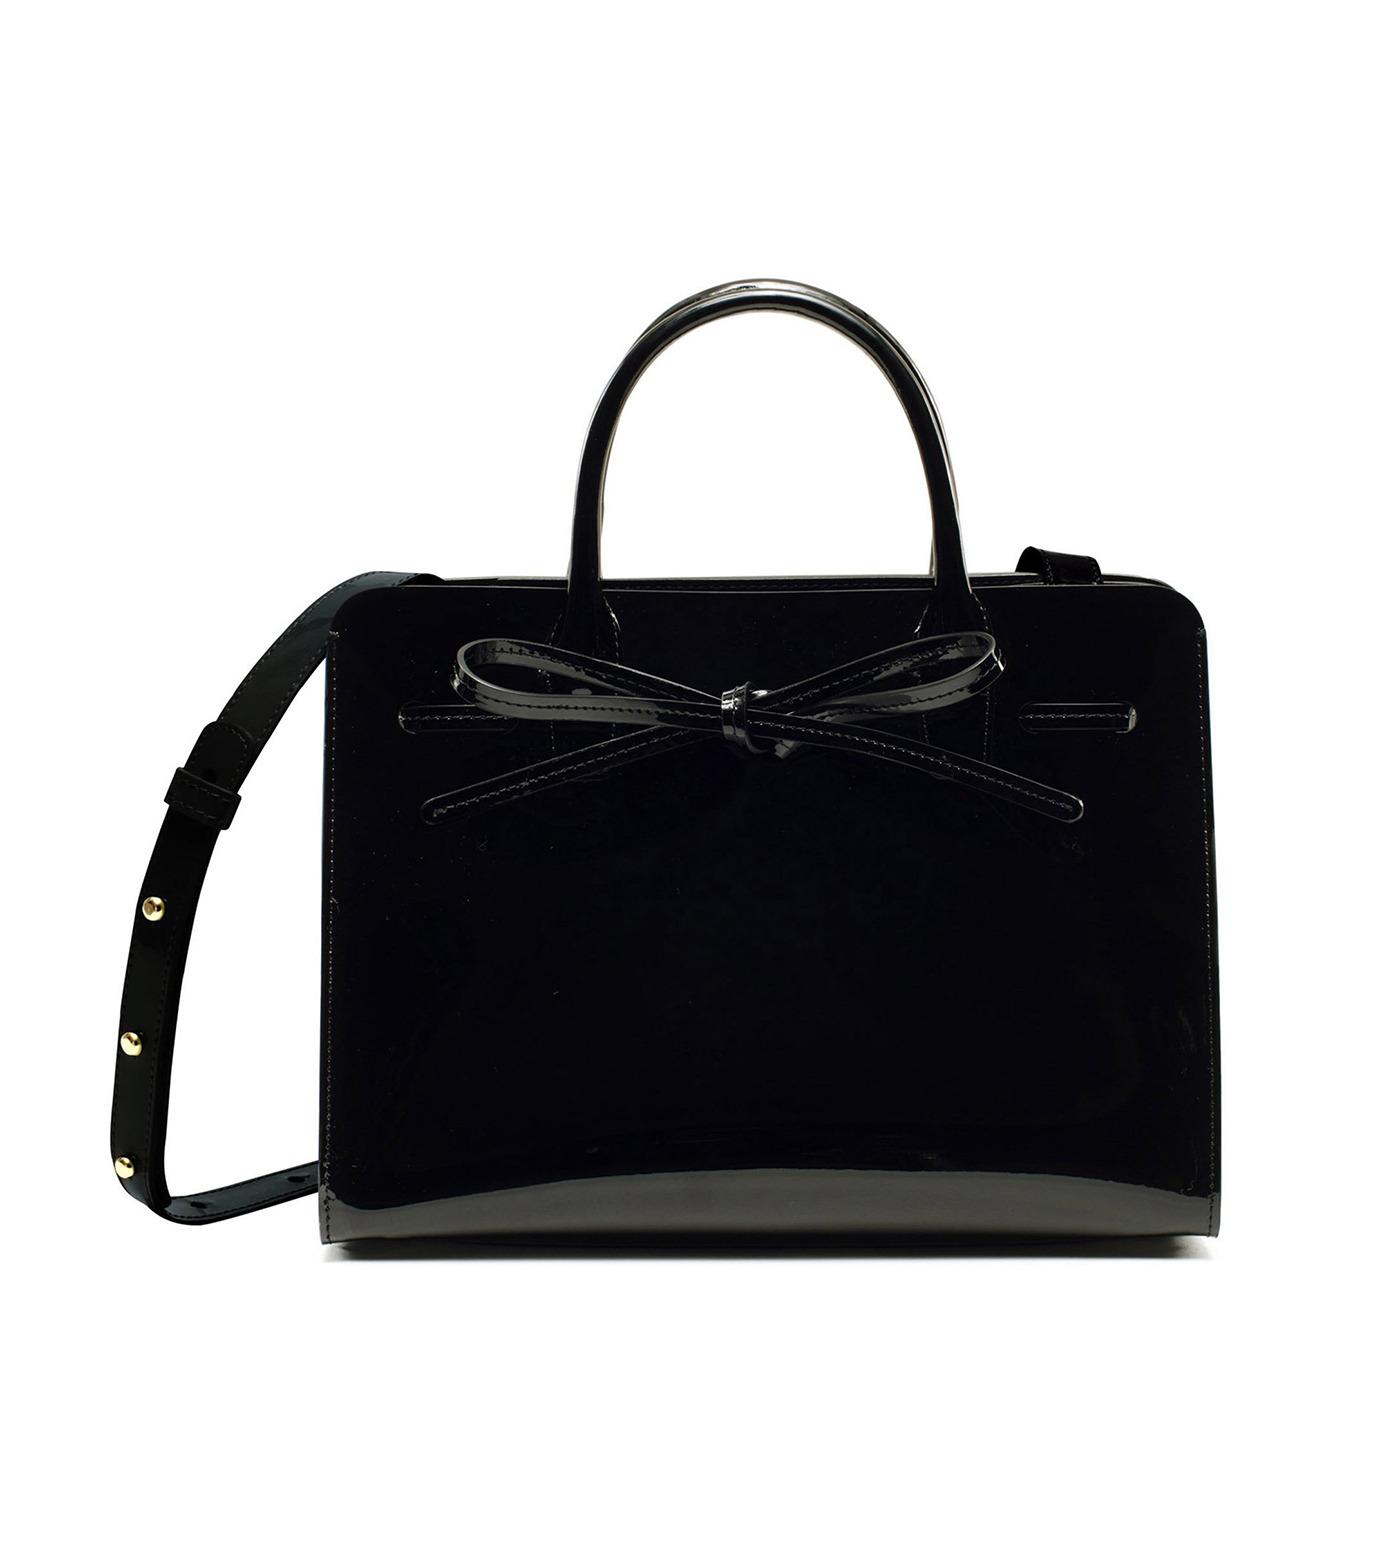 Mansur Gavriel(マンサーガブリエル)のpatent mini sun bag-BLACK(ハンドバッグ/hand bag)-HMS030PA-13 拡大詳細画像4